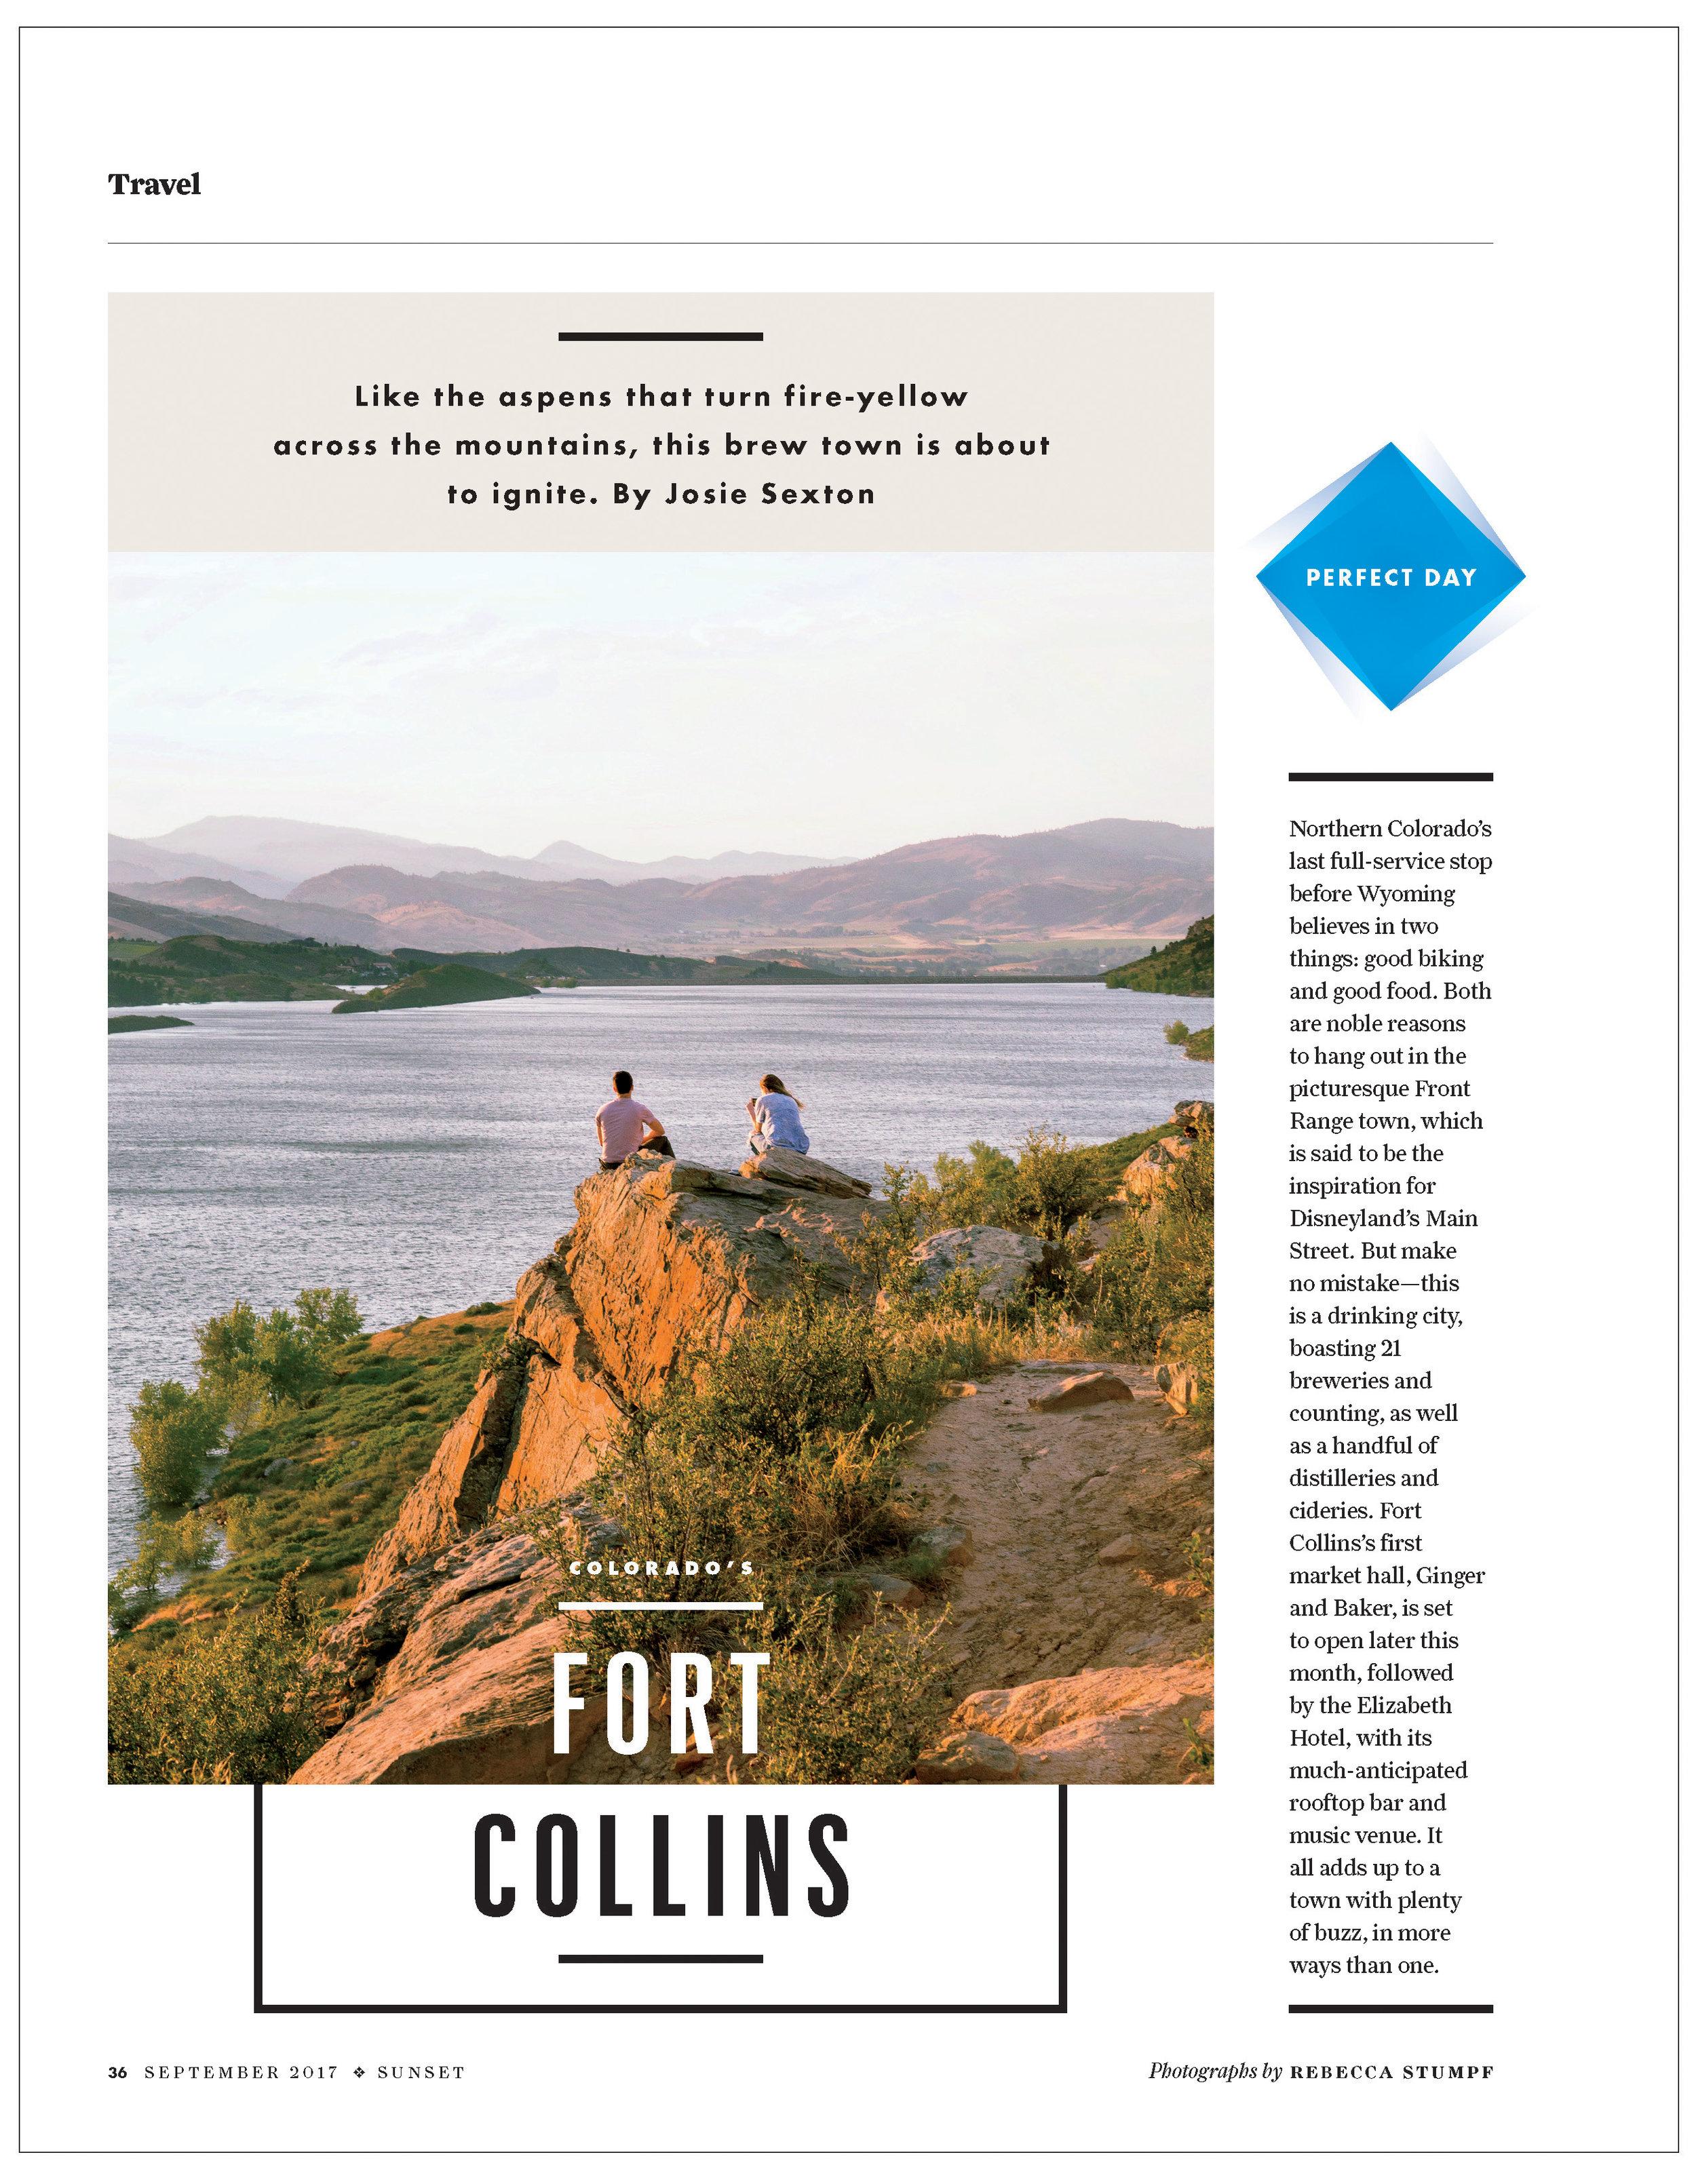 Rstumpf_Sunsetmagazine_fortCollins.jpg